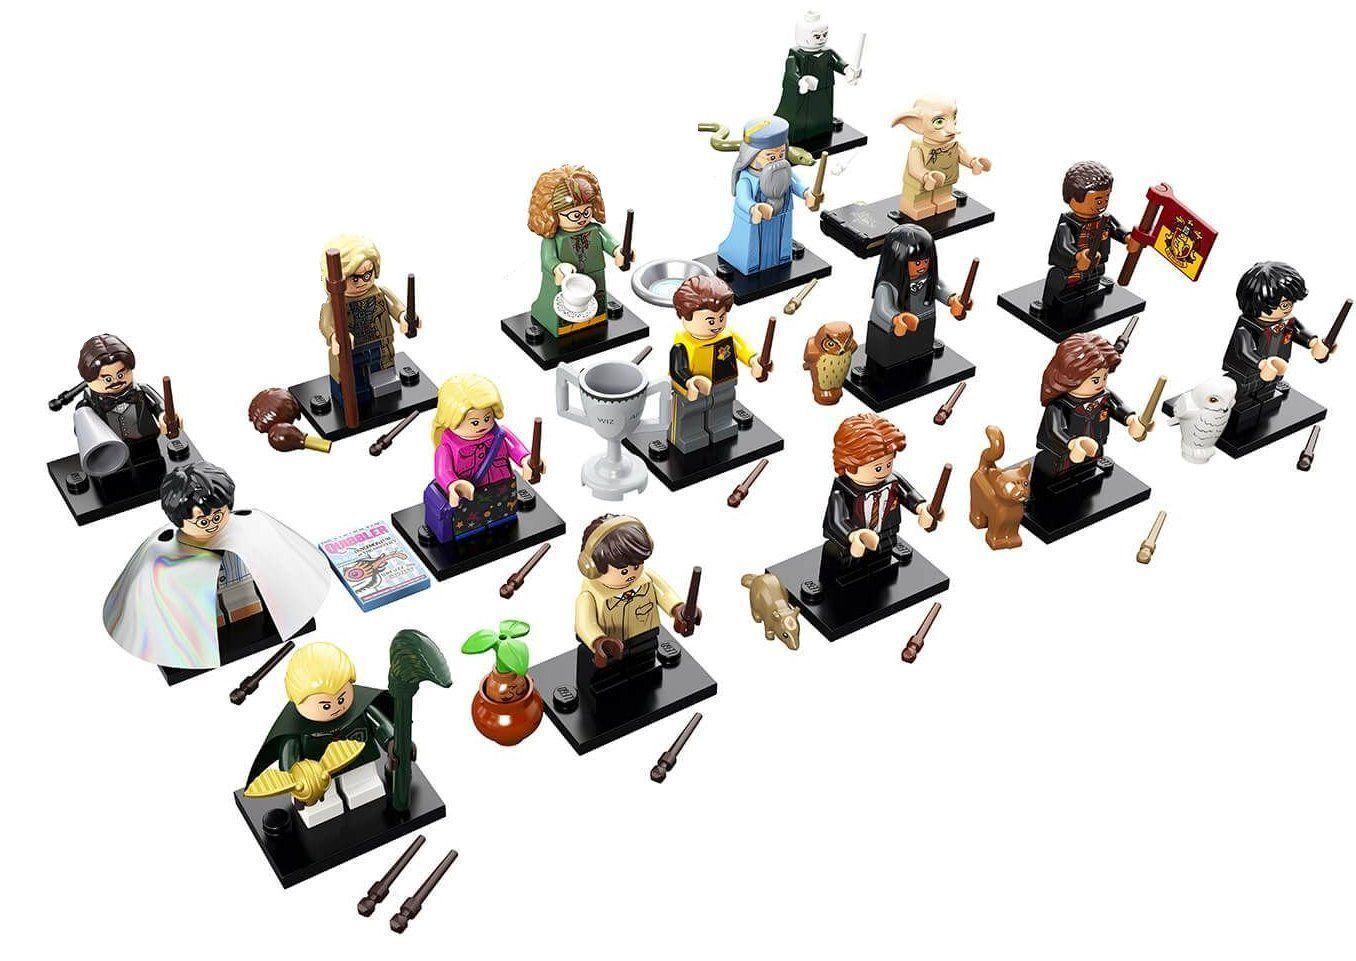 LEGO 71022 SATZ - Harry Potter Fantastic Beasts - 16 MINIFIGUREN - Lieferbar